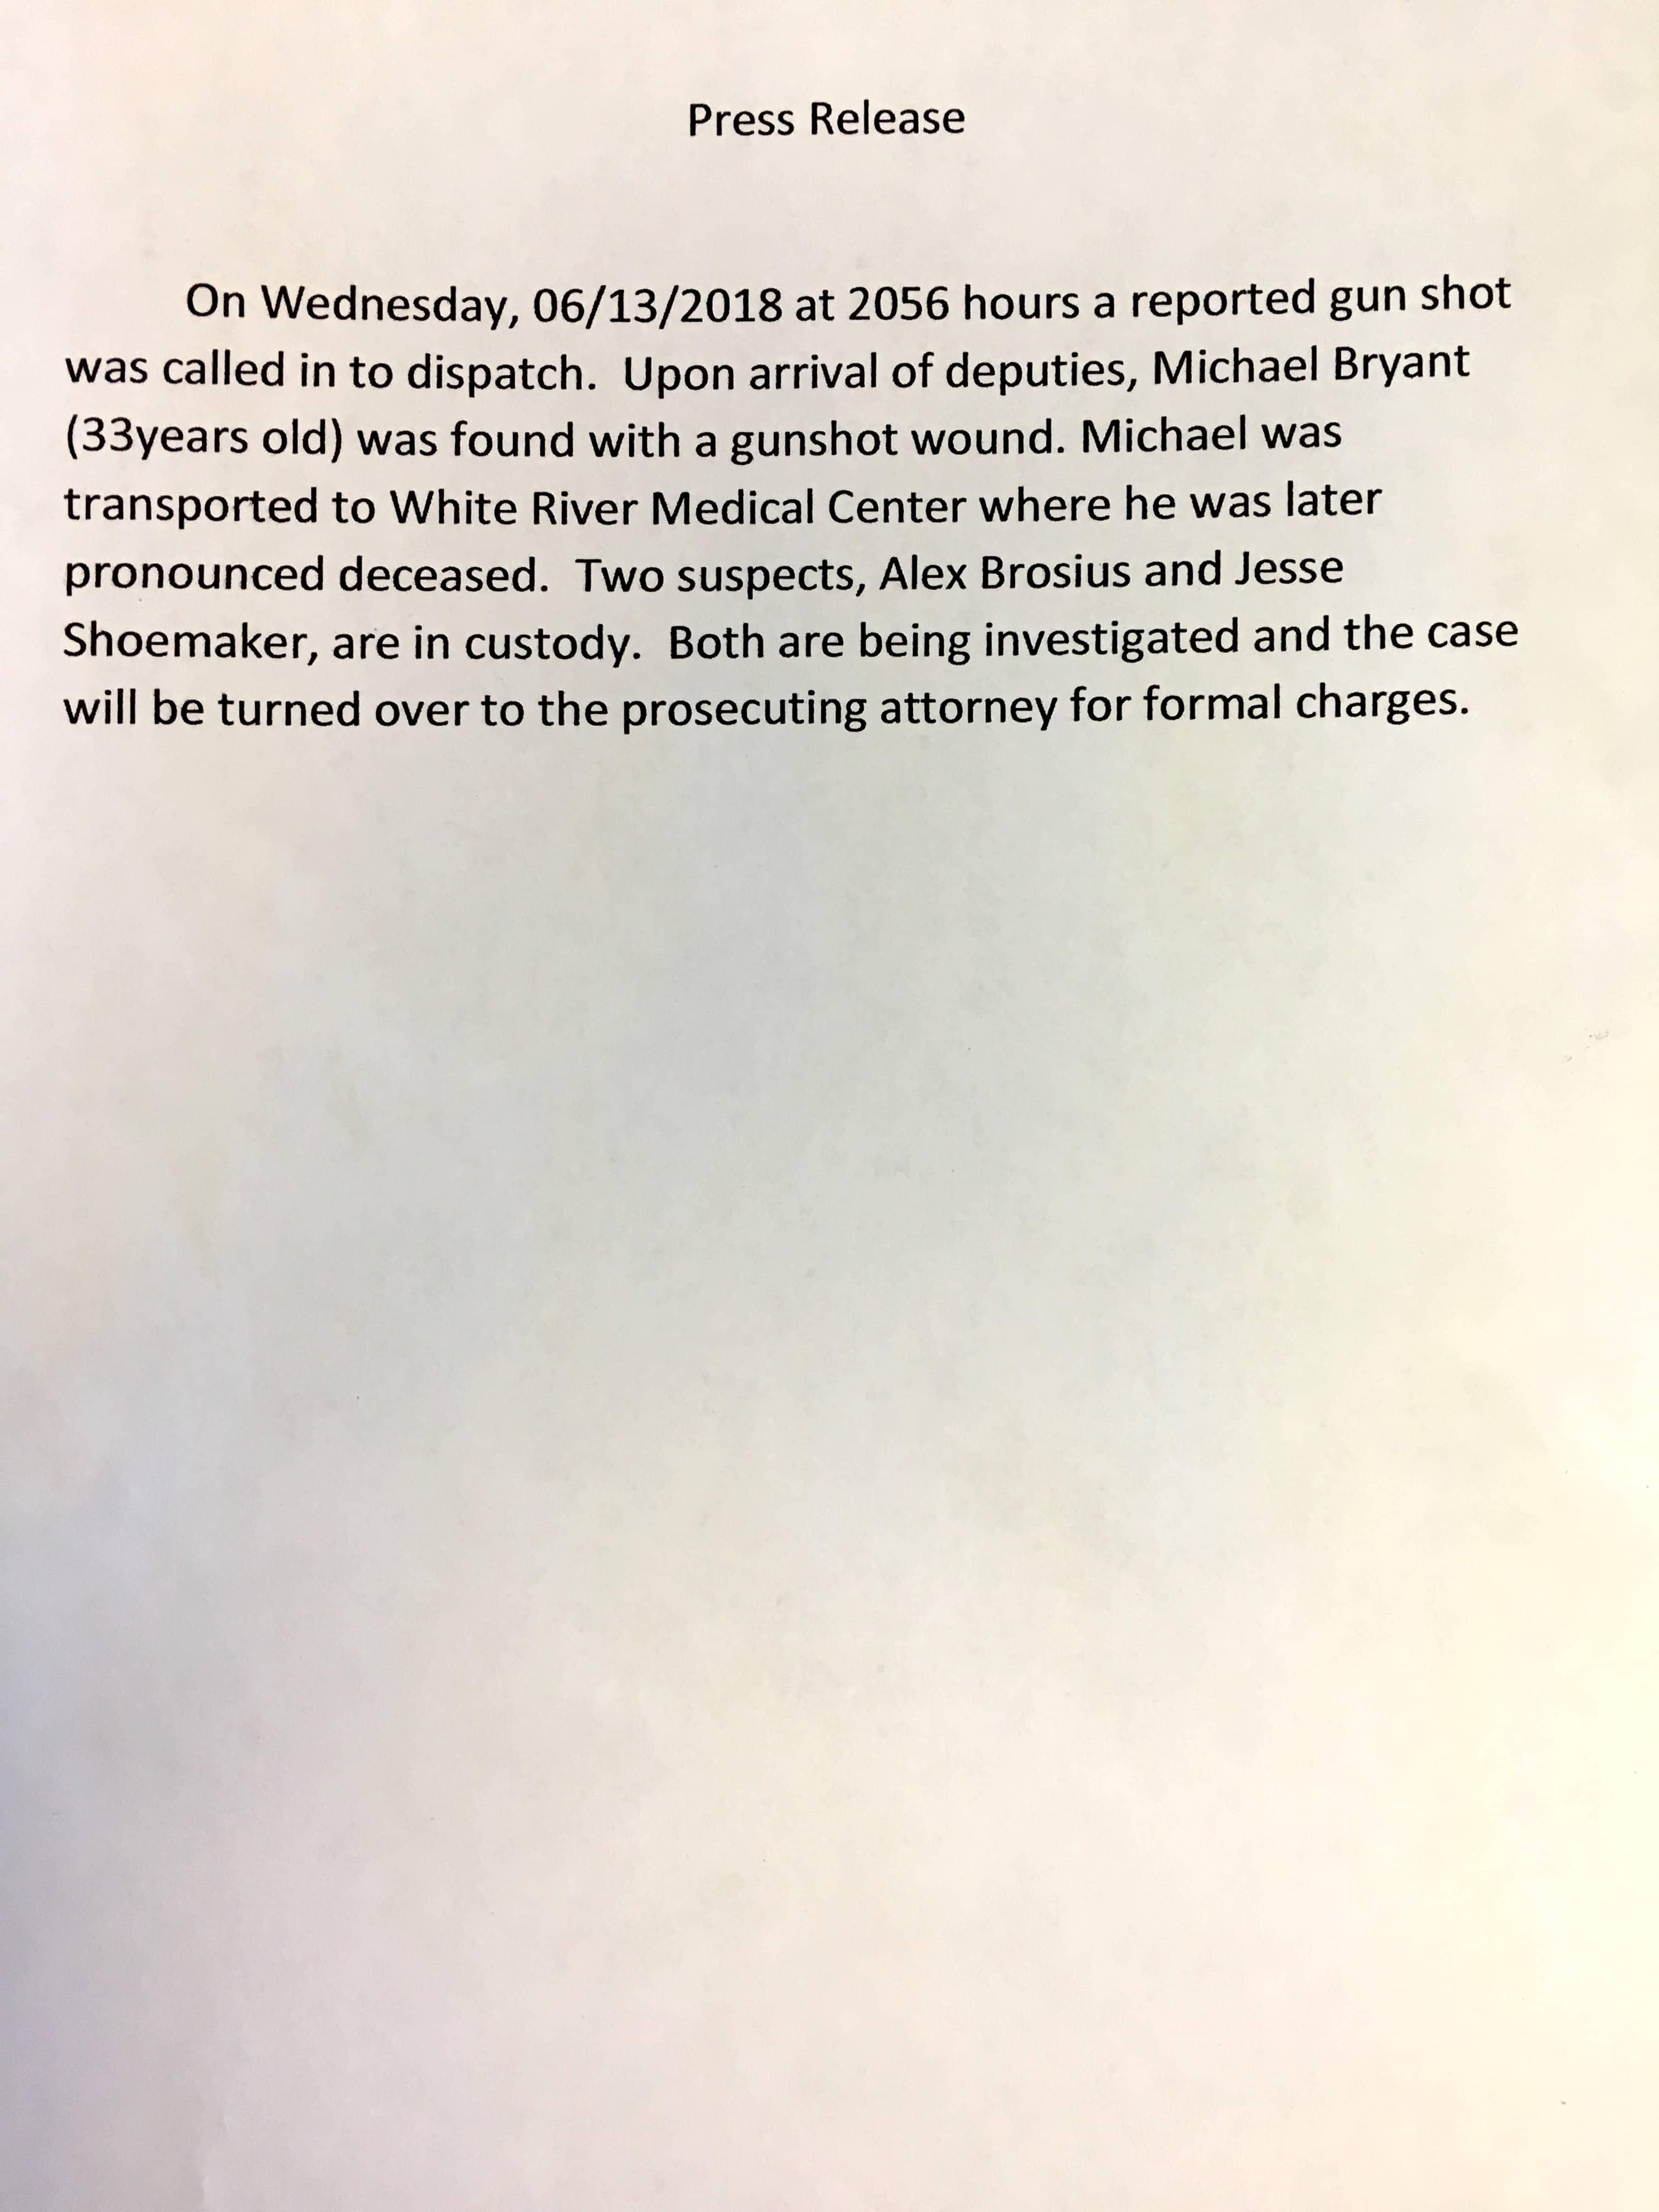 Brosius press release.jpg